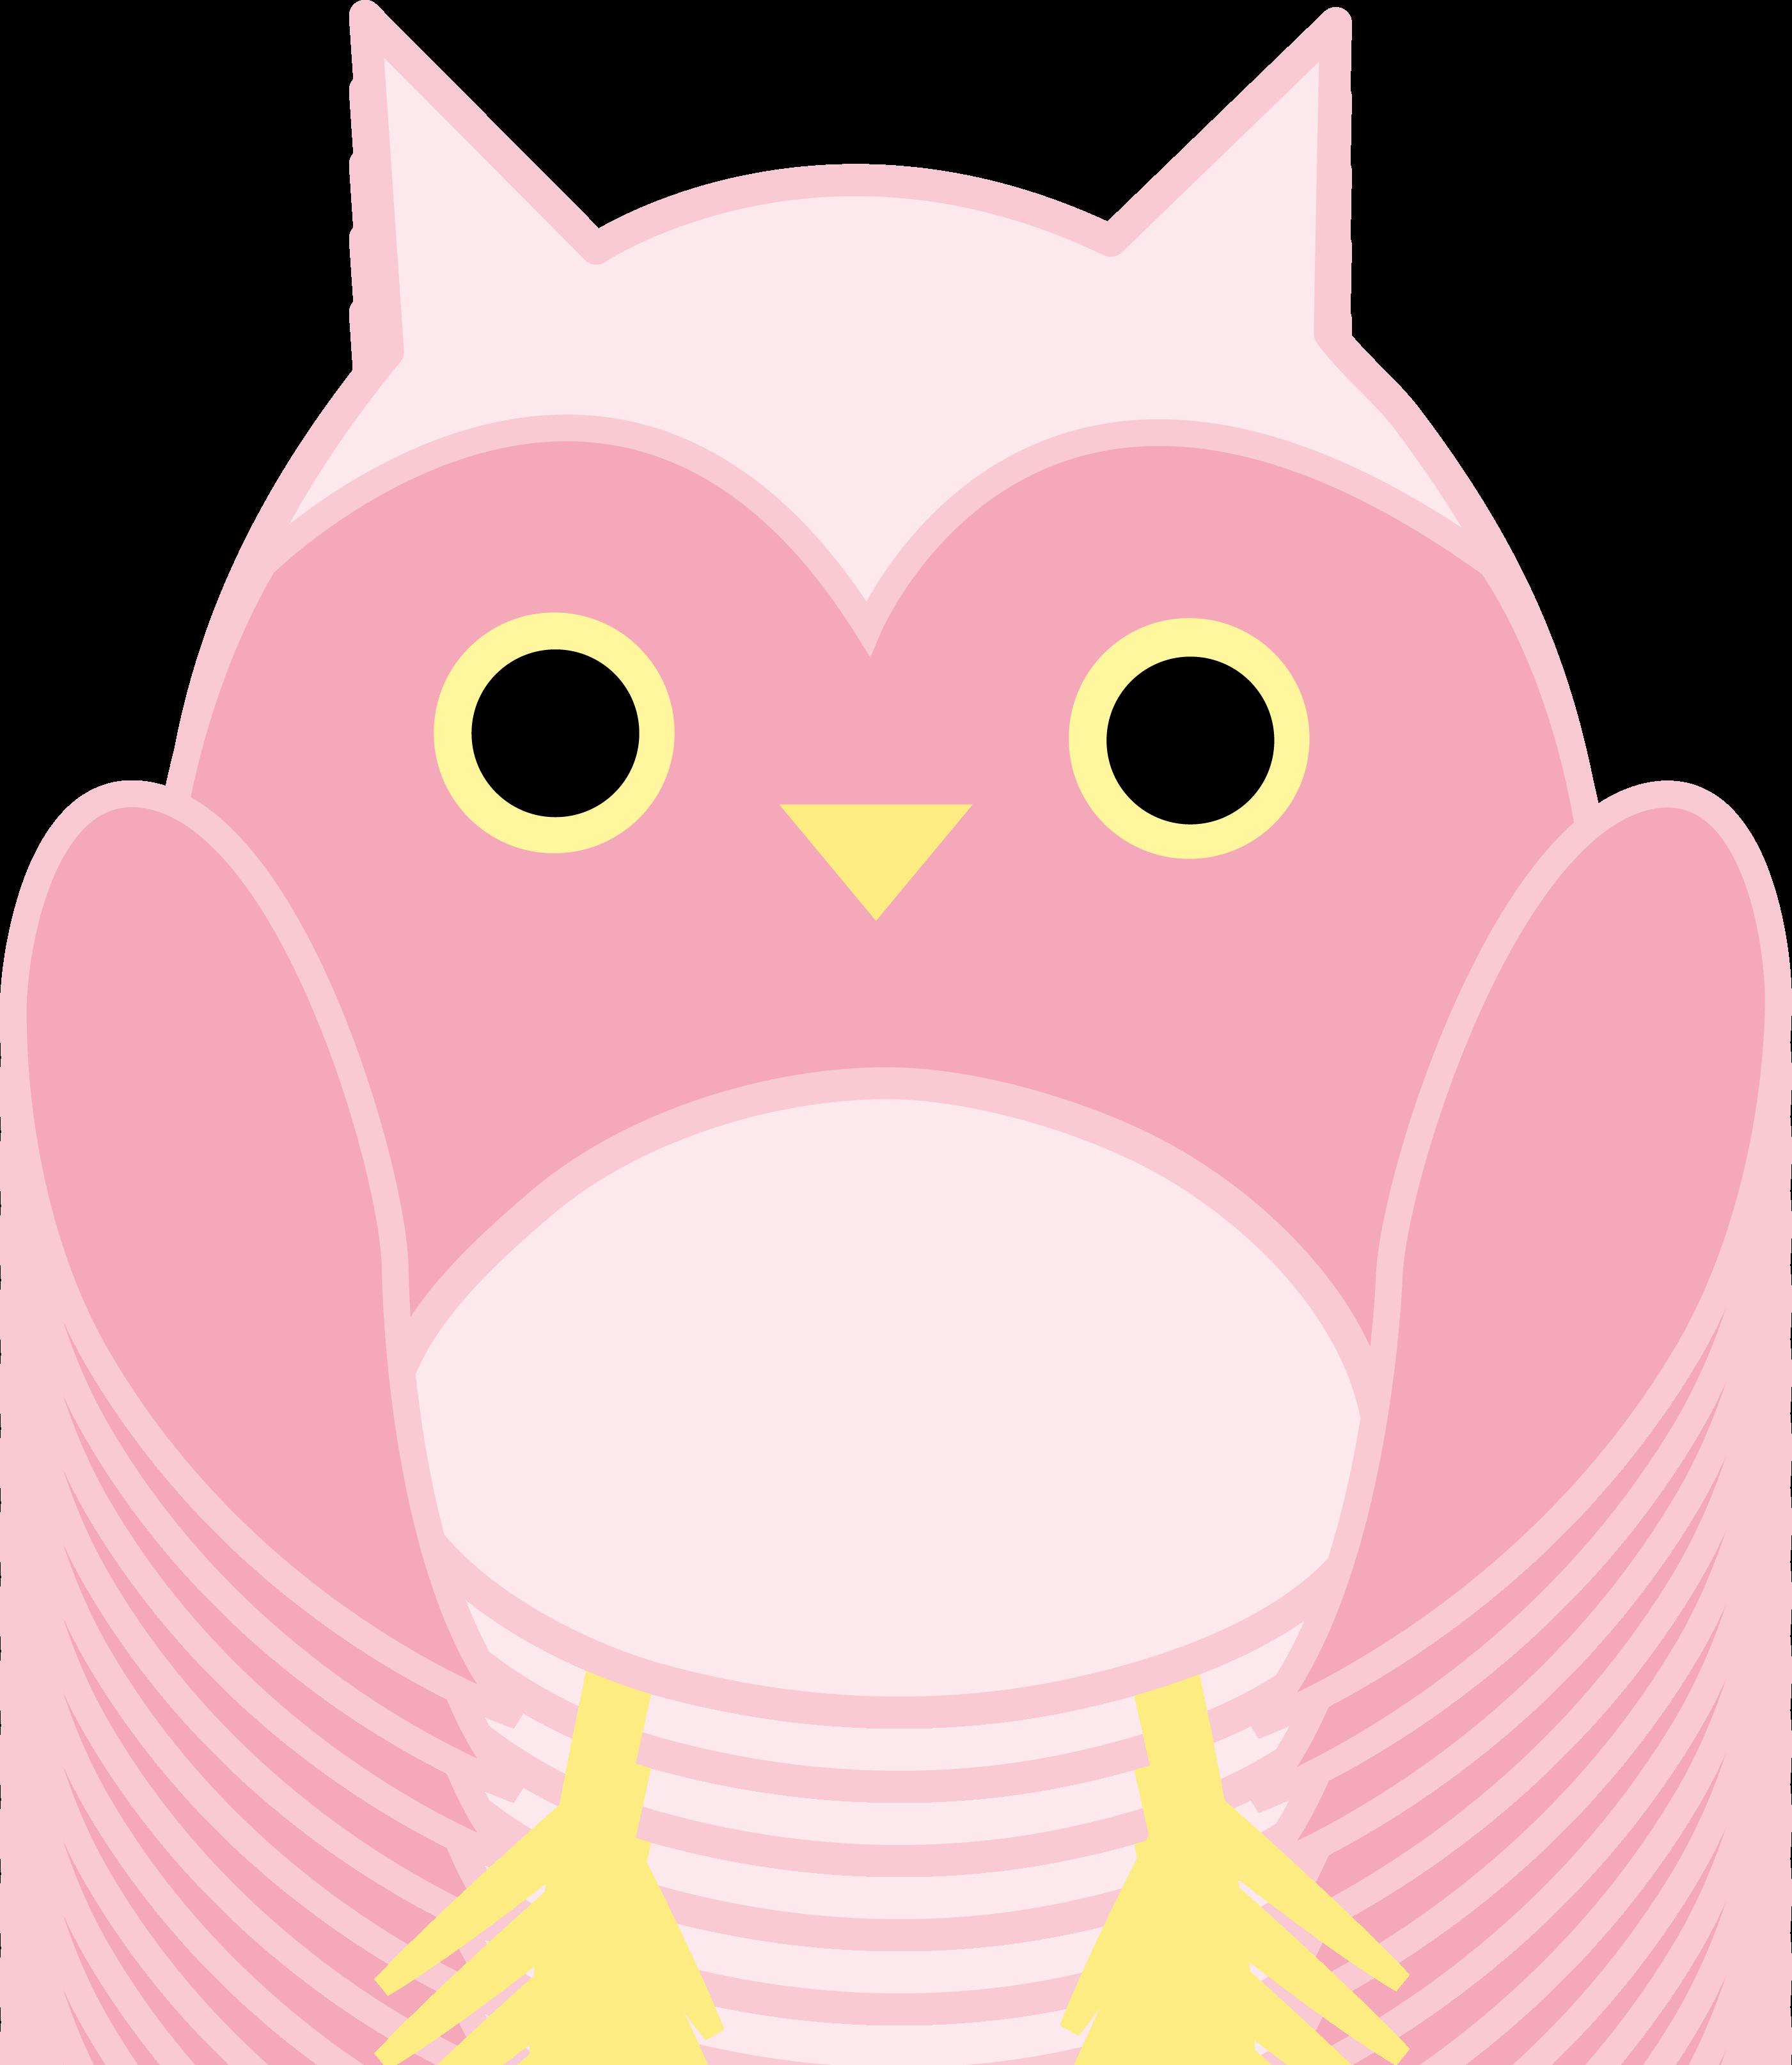 u203f u2040 s u203f u2040 pinterest pink owl owl and rh pinterest co uk